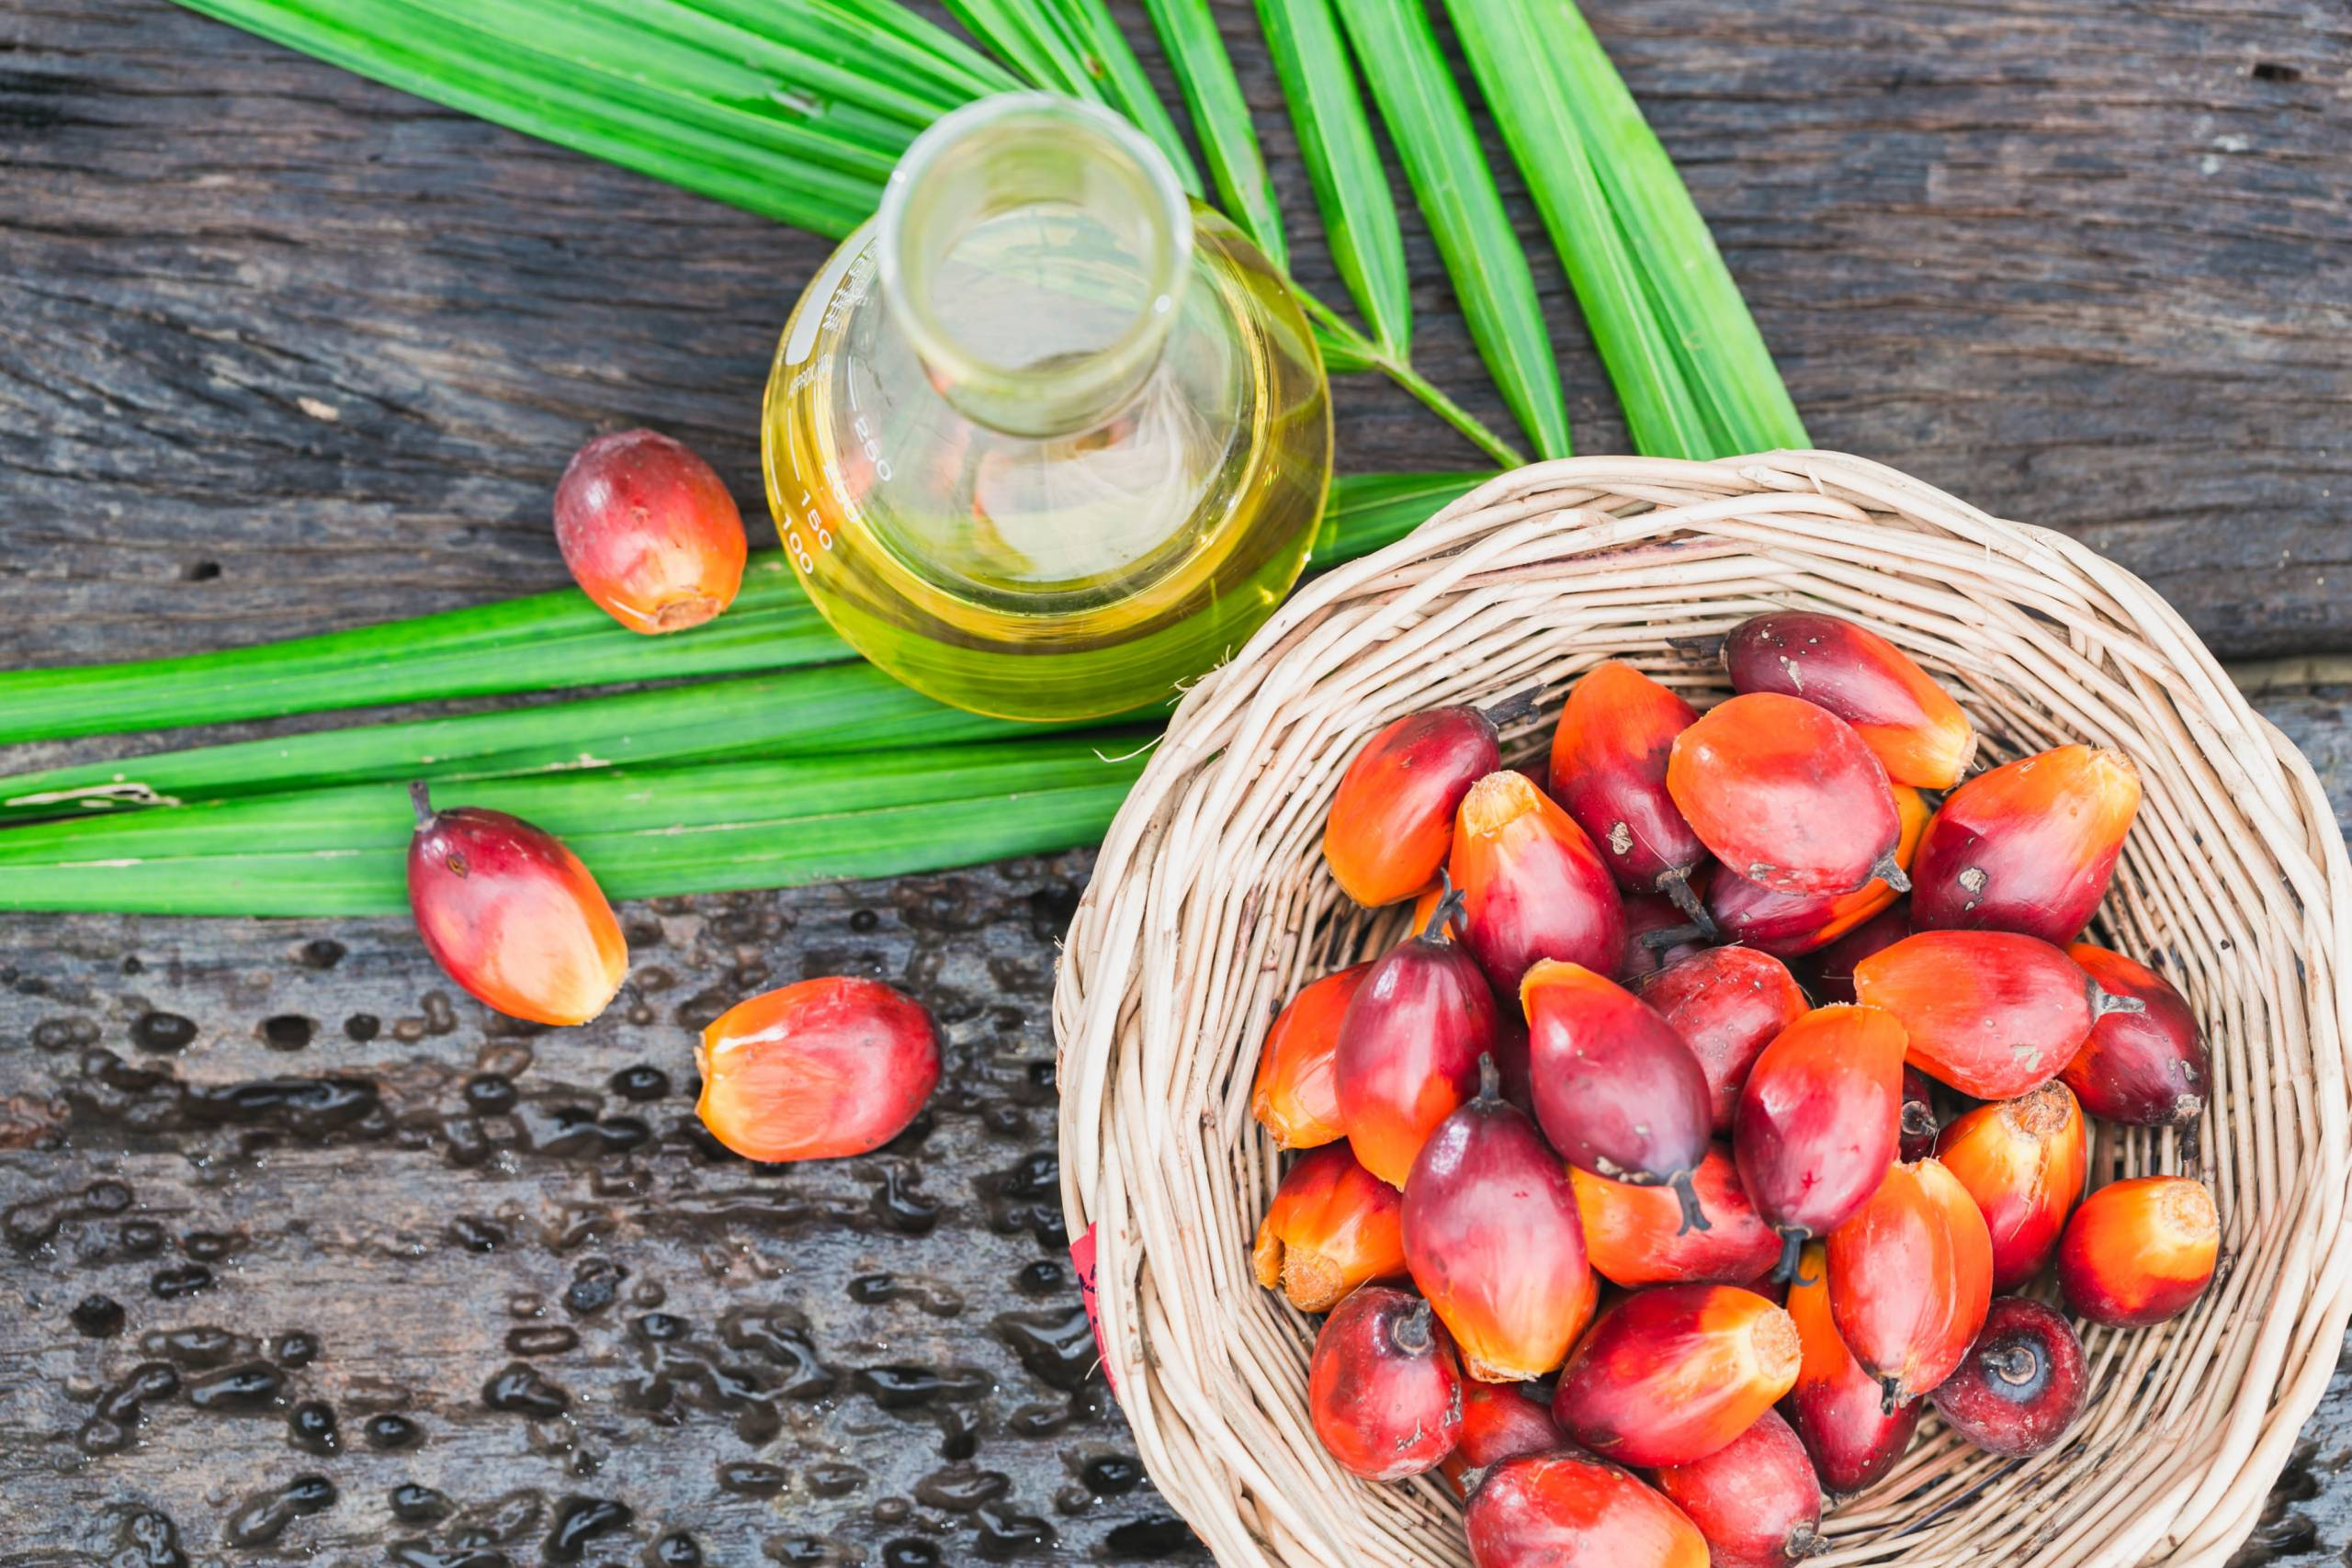 Grasimi vegetale de palmier